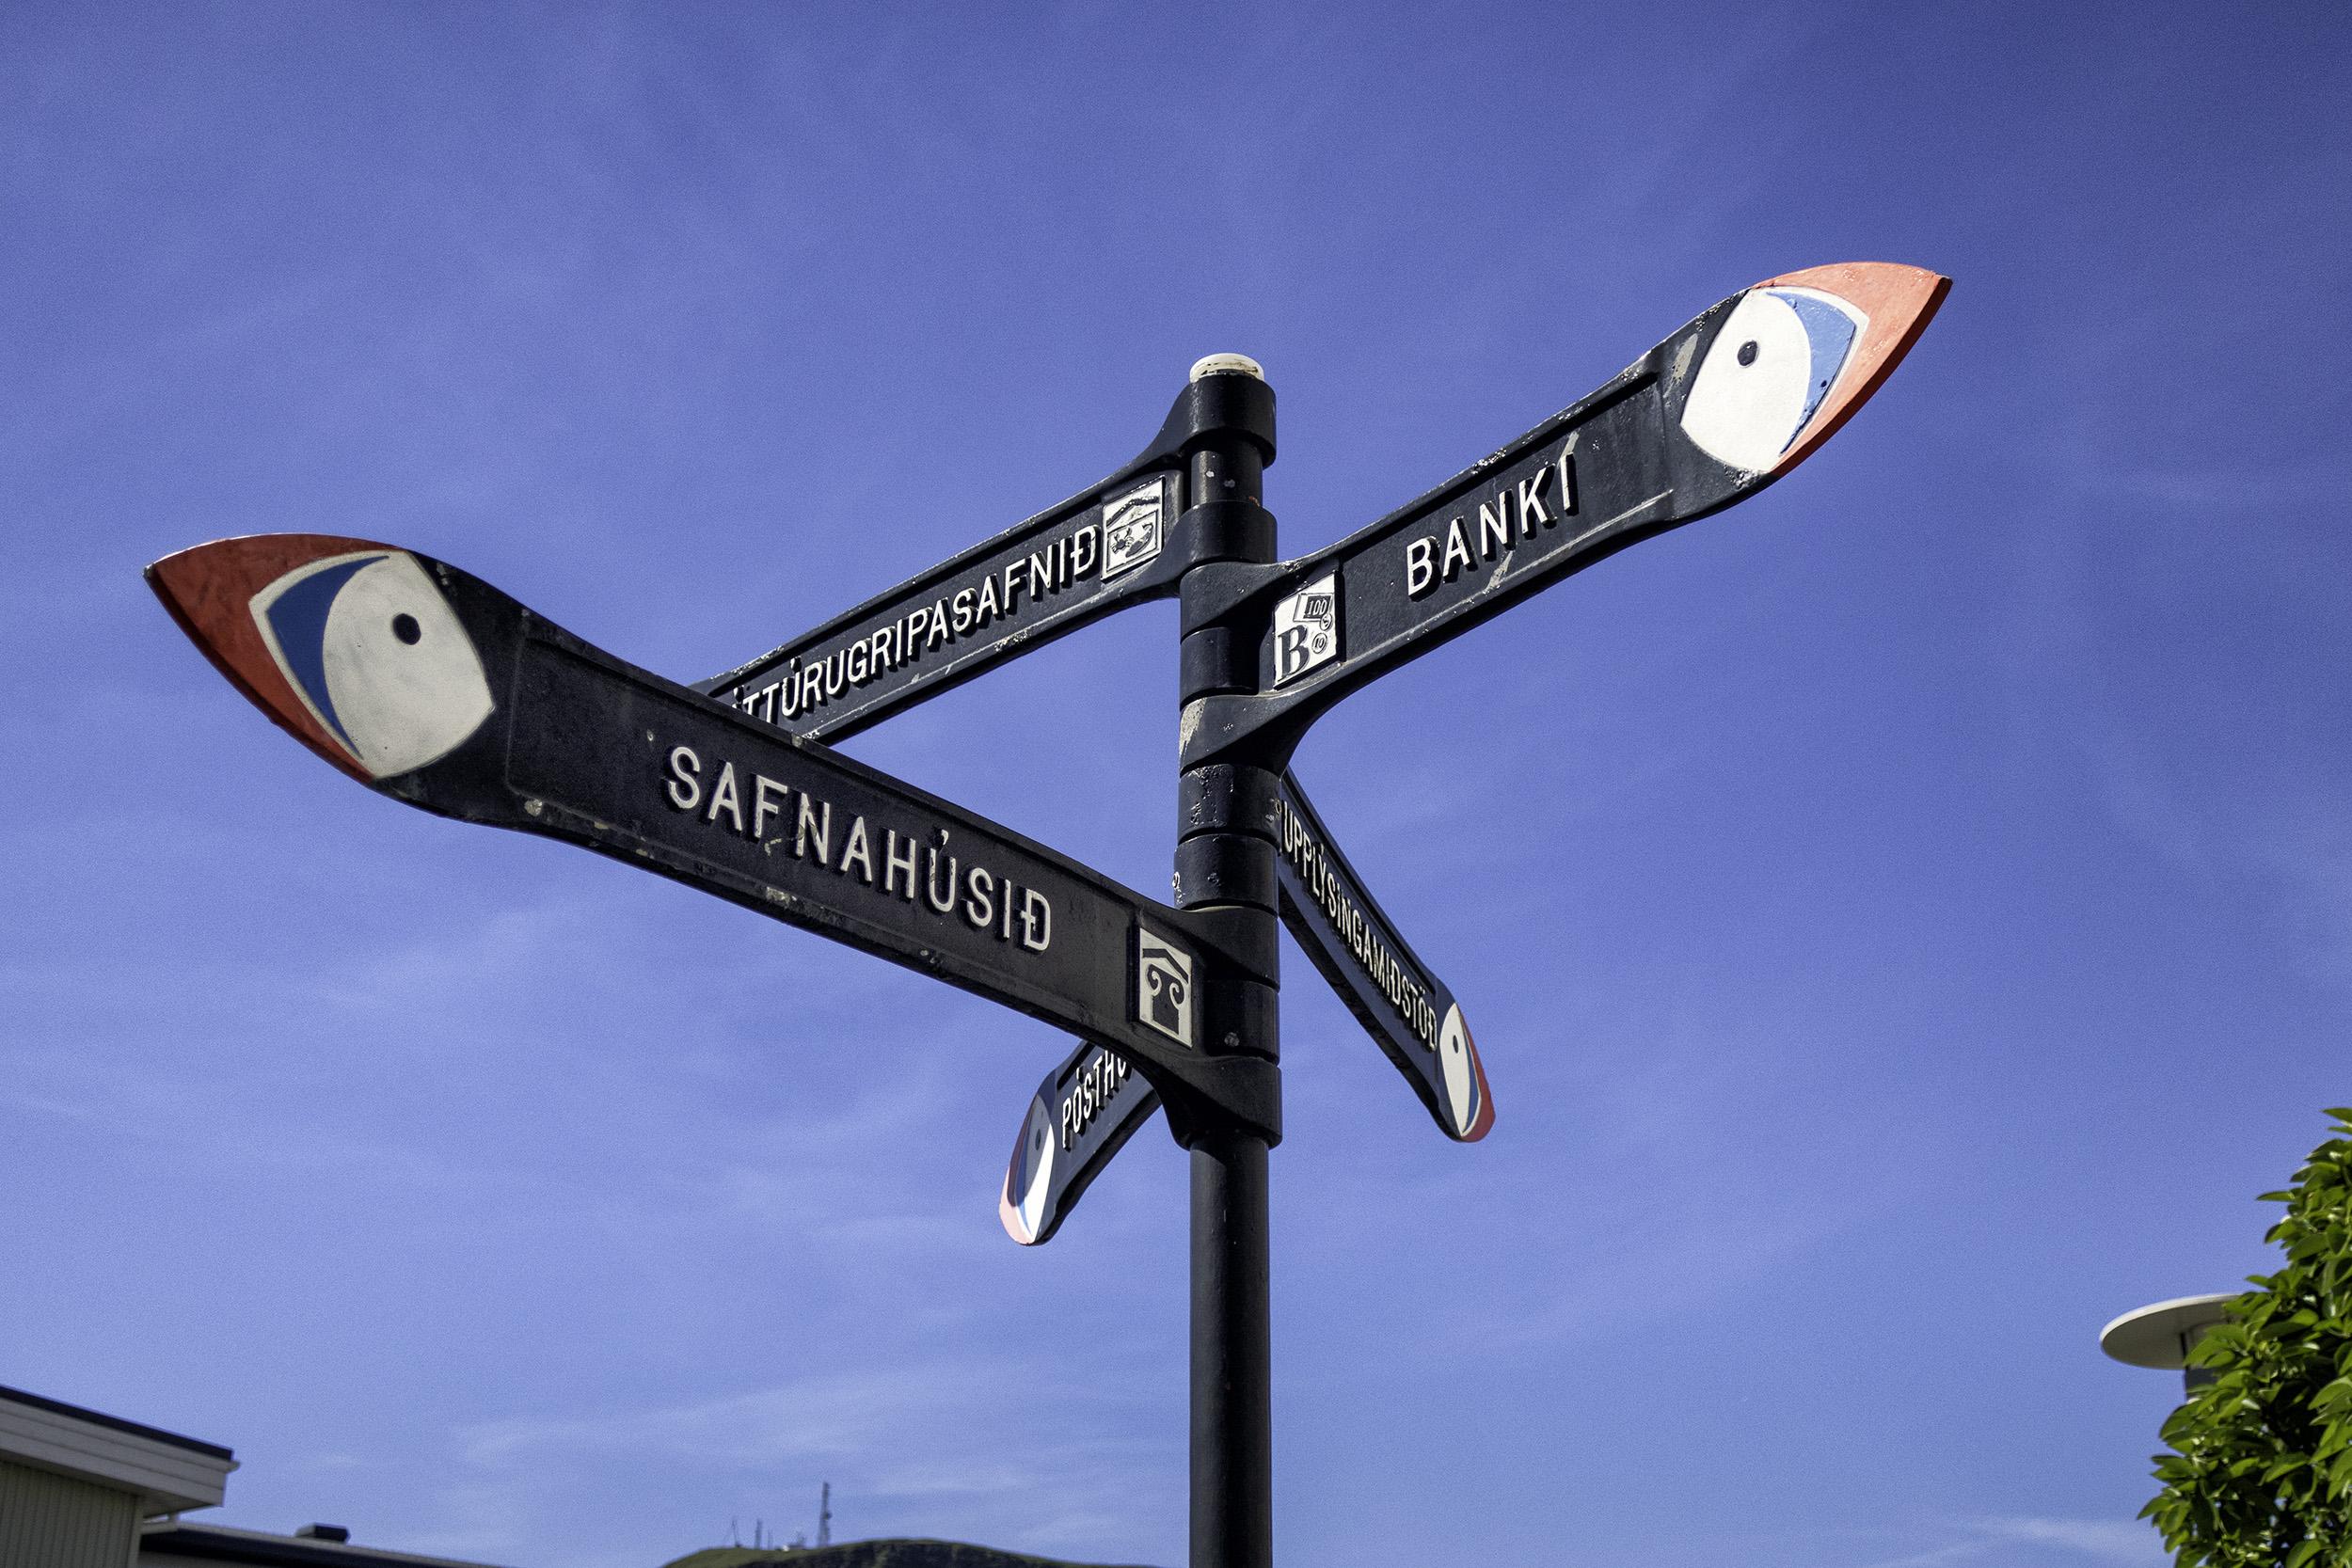 Heiamey Street Signs